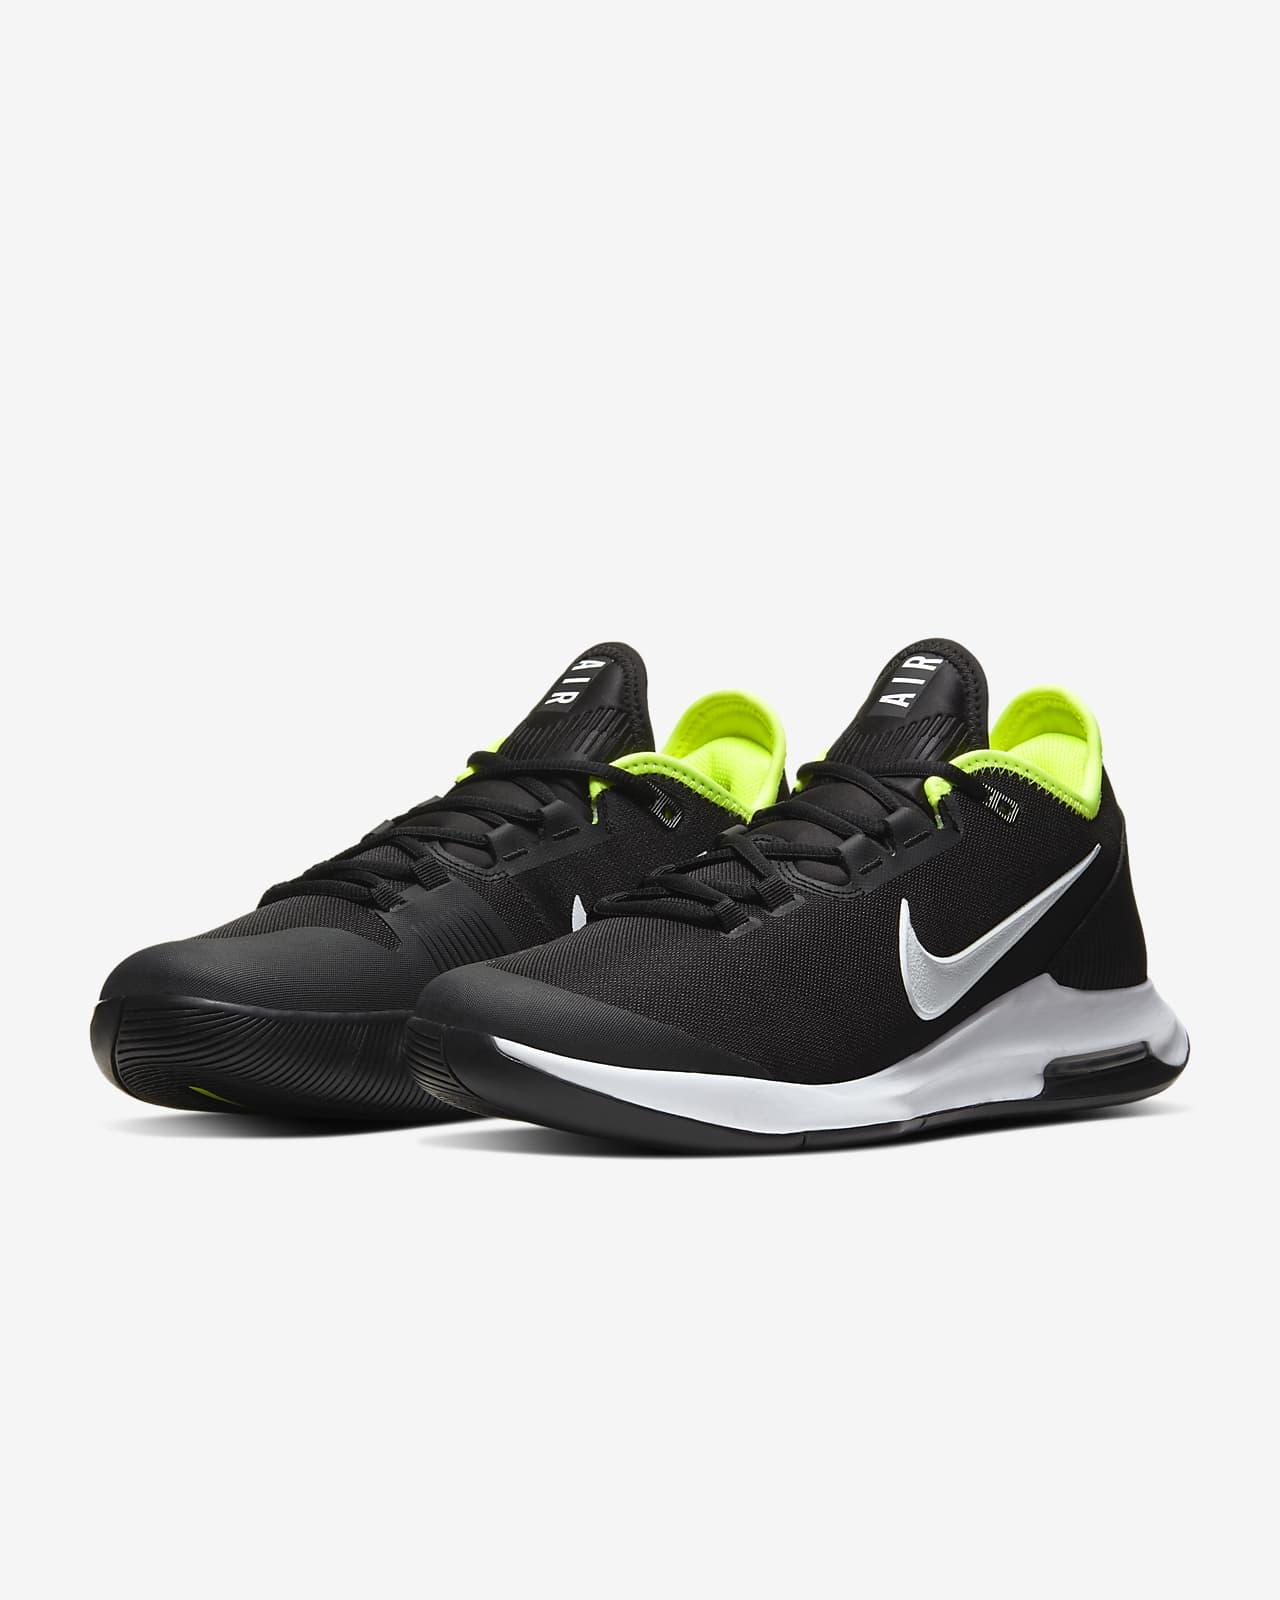 NikeCourt Air Max Wildcard Men's Tennis